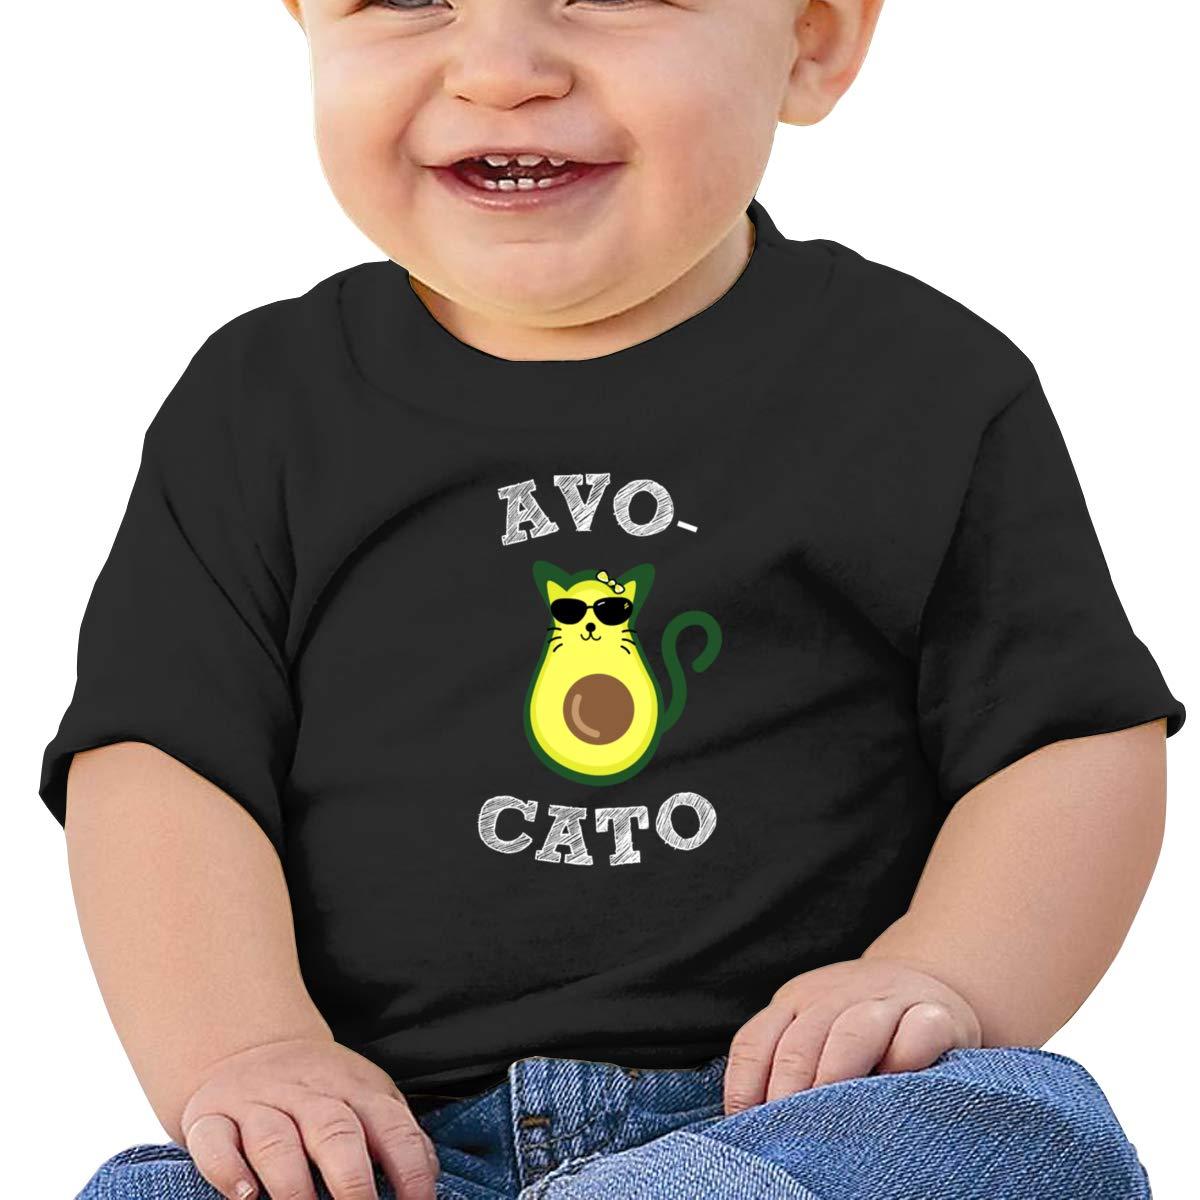 Avocado Cat Short Sleeve T-Shirts Baby Boy